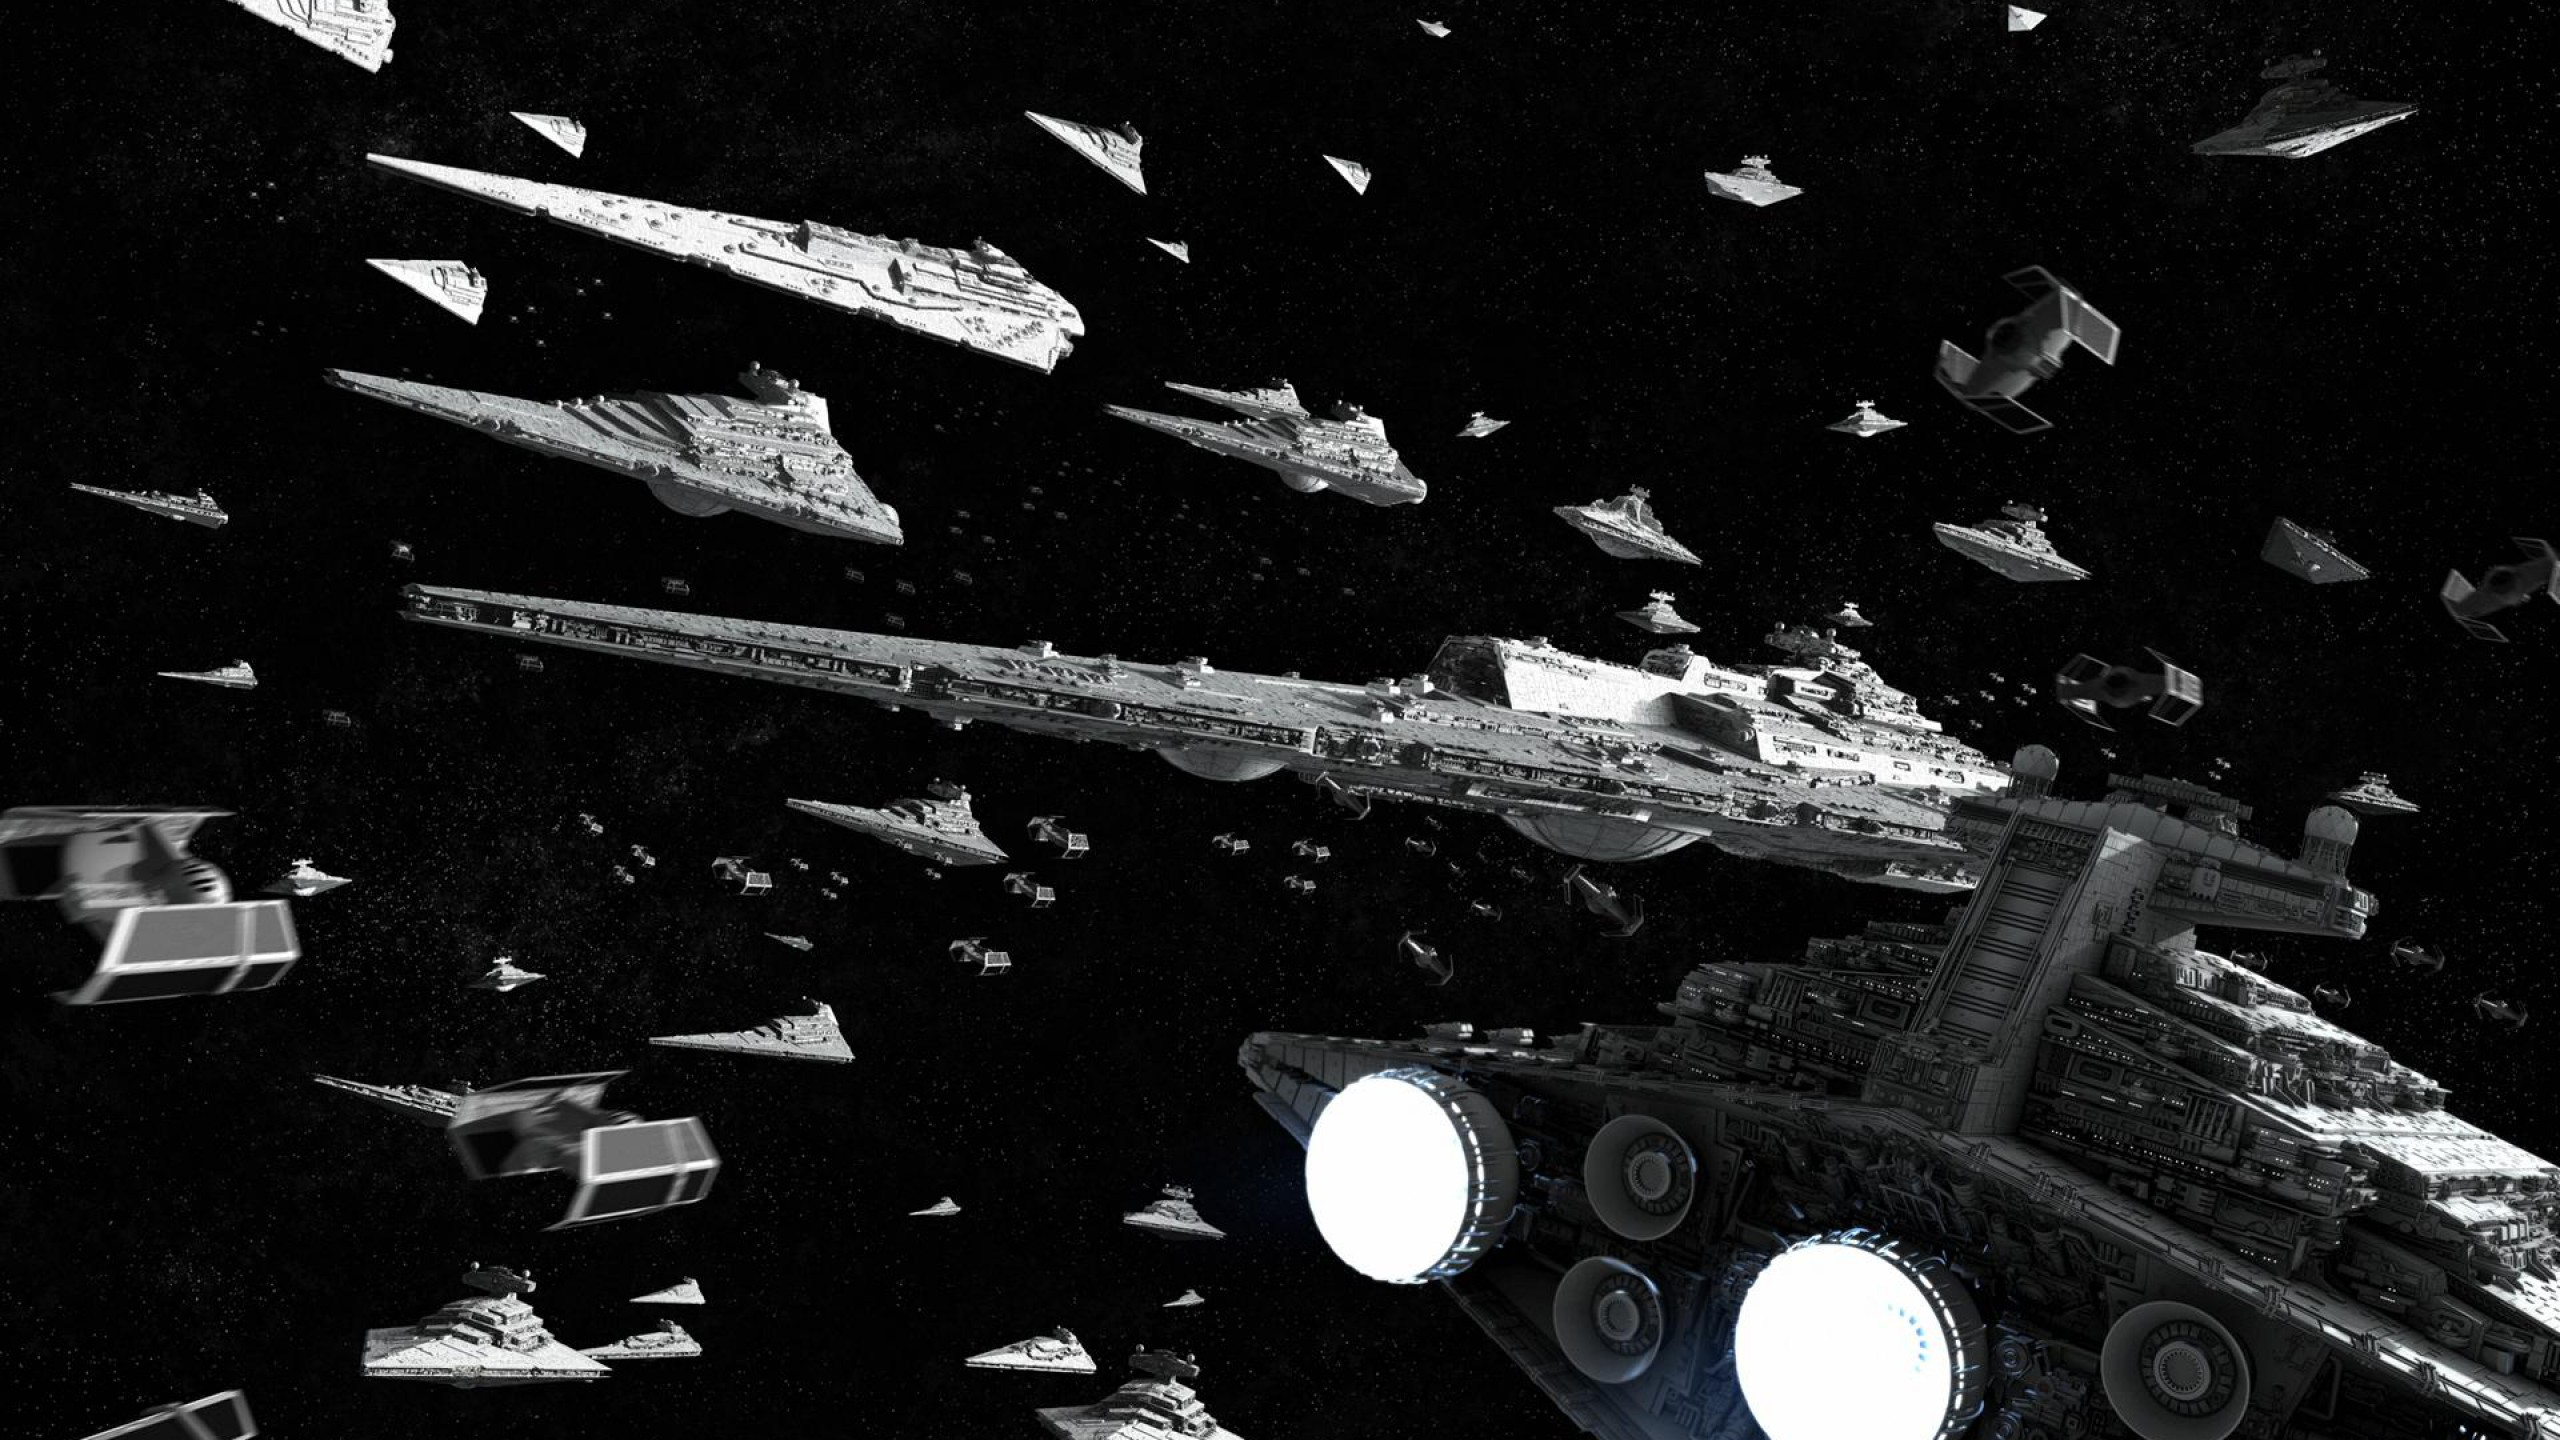 Star Wars Wallpaper 4k Empire 1366x768 Download Hd Wallpaper Wallpapertip